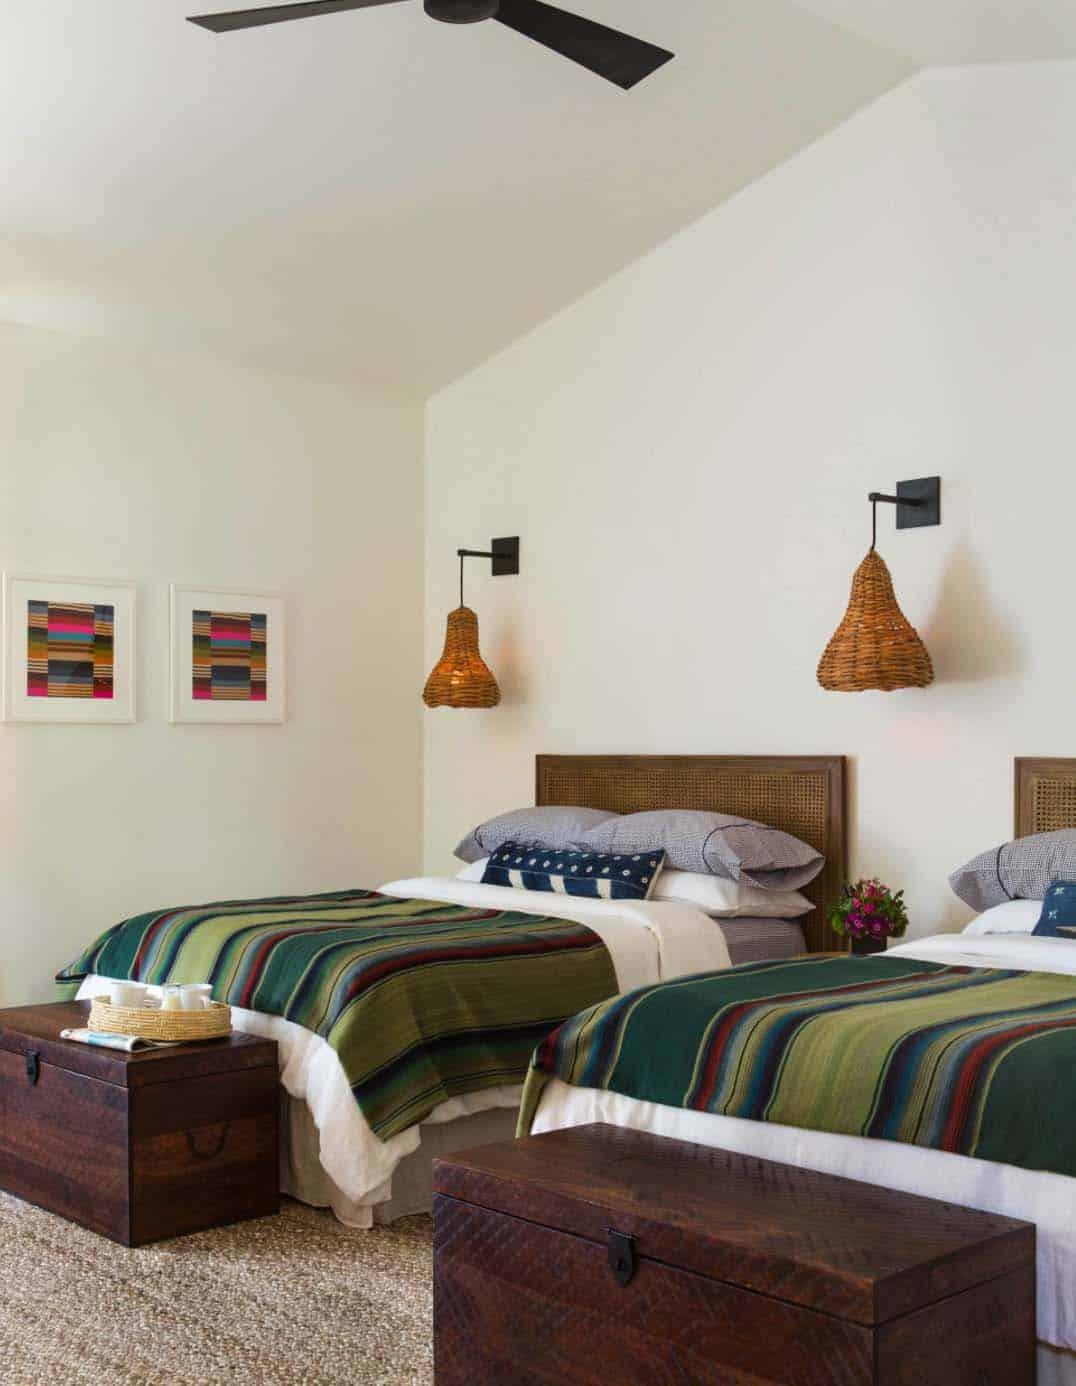 Mediterranean Style Villa-Jute Interior Design-10-1 Kindesign